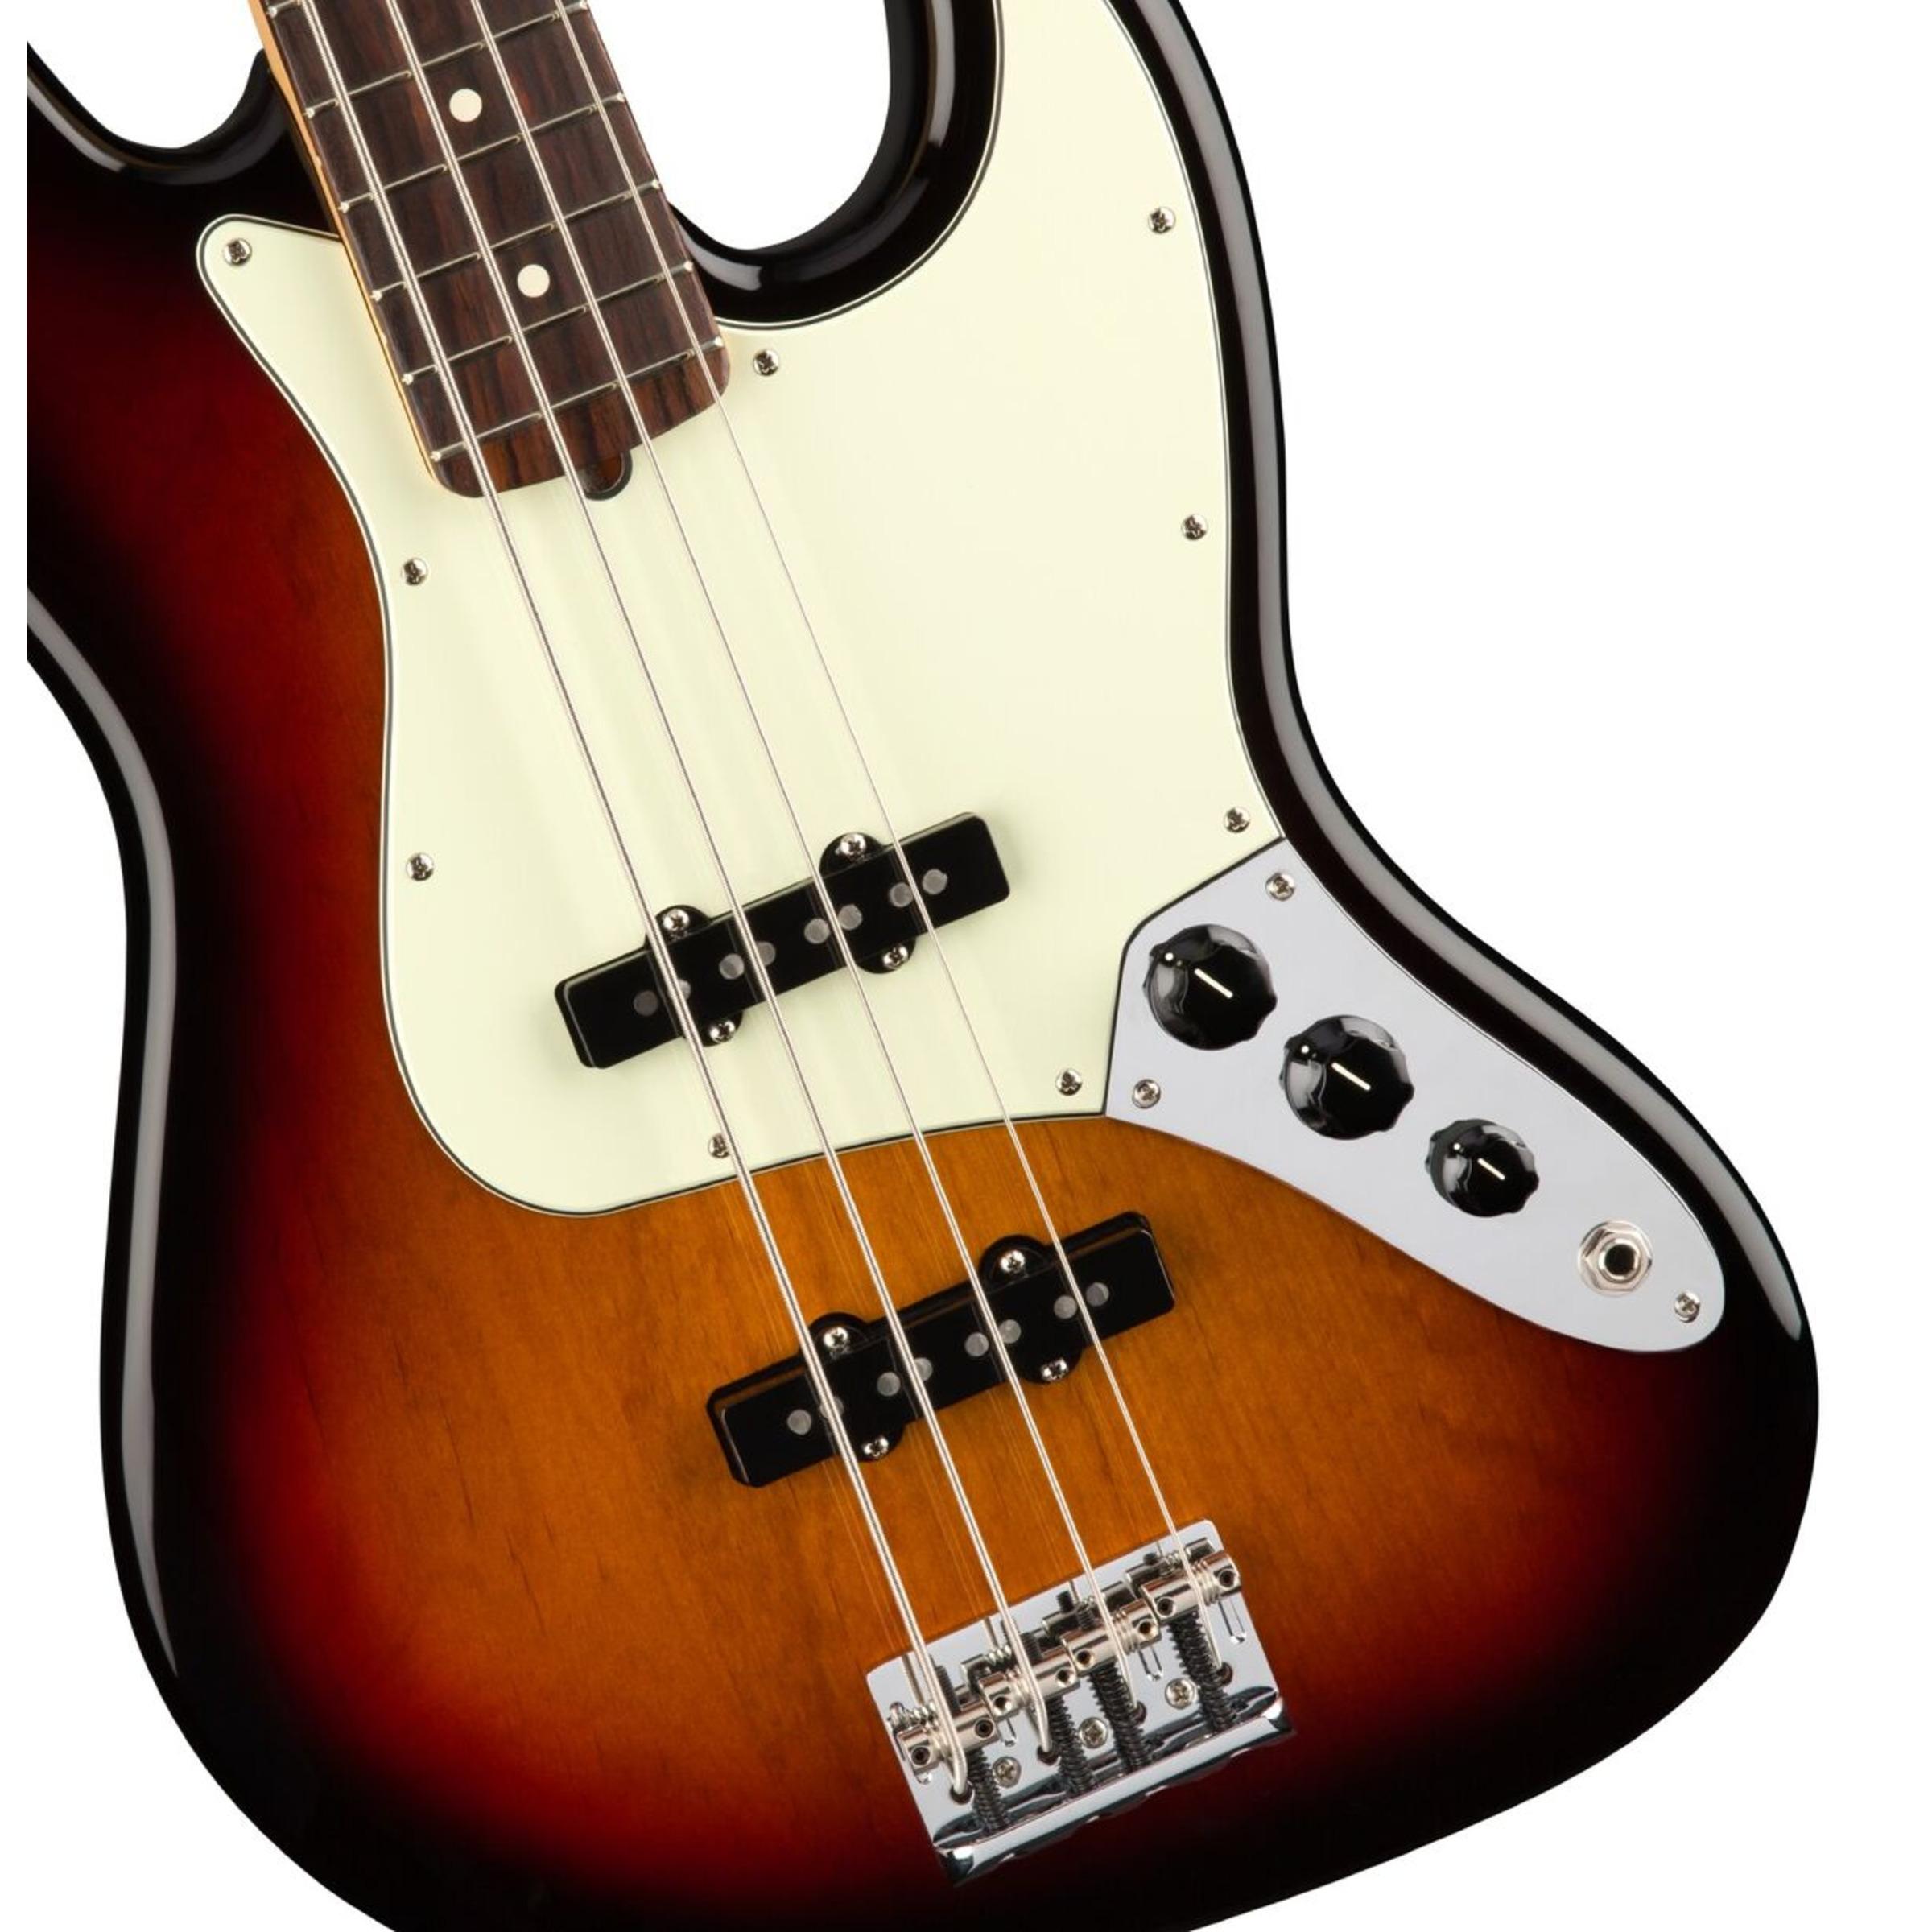 fender american pro jazz bass rosewood fingerboard giggear. Black Bedroom Furniture Sets. Home Design Ideas